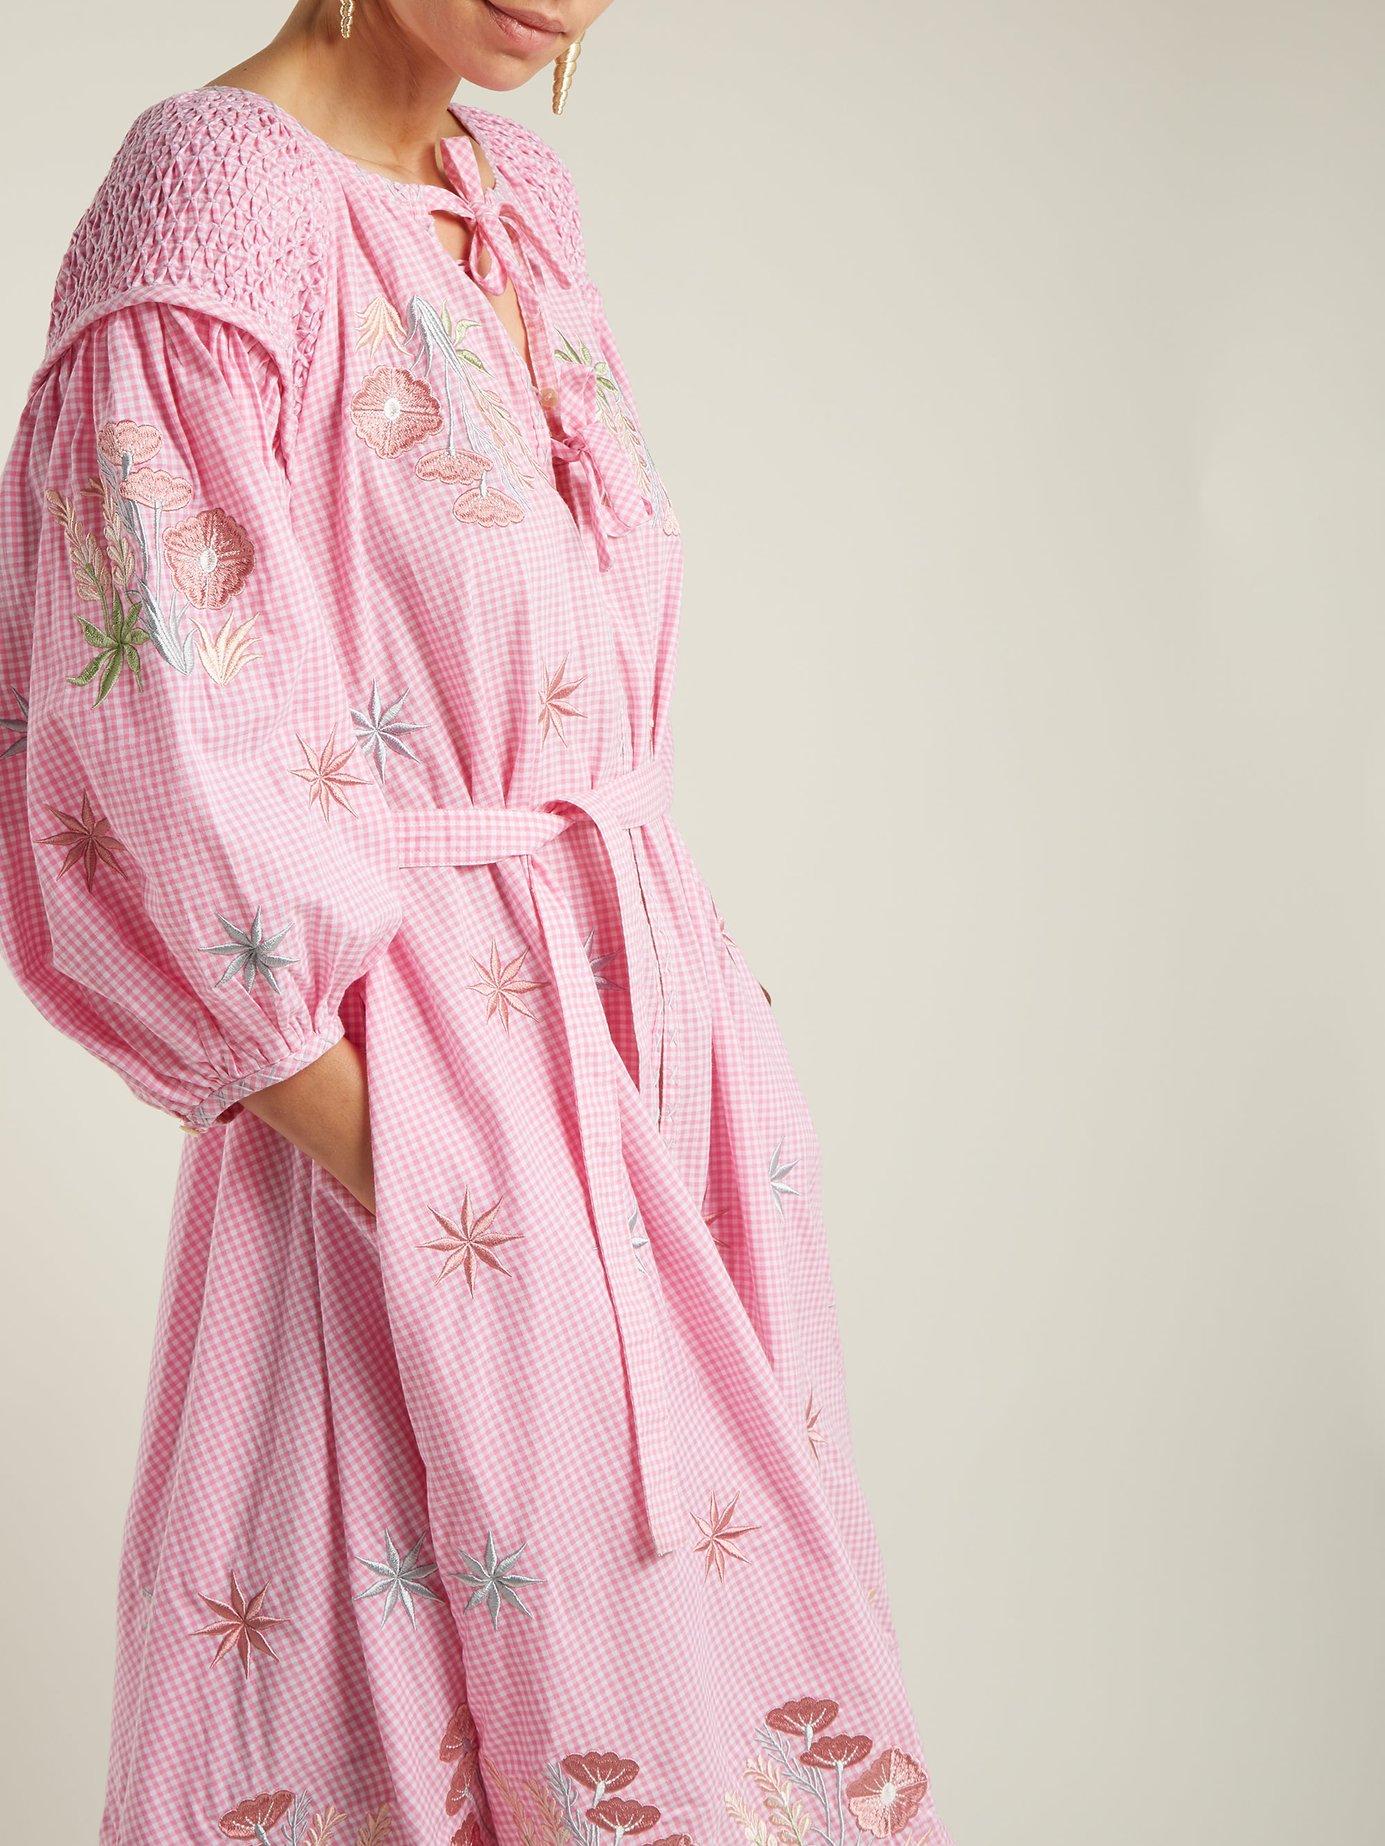 Gingham balloon-sleeve cotton dress by Innika Choo